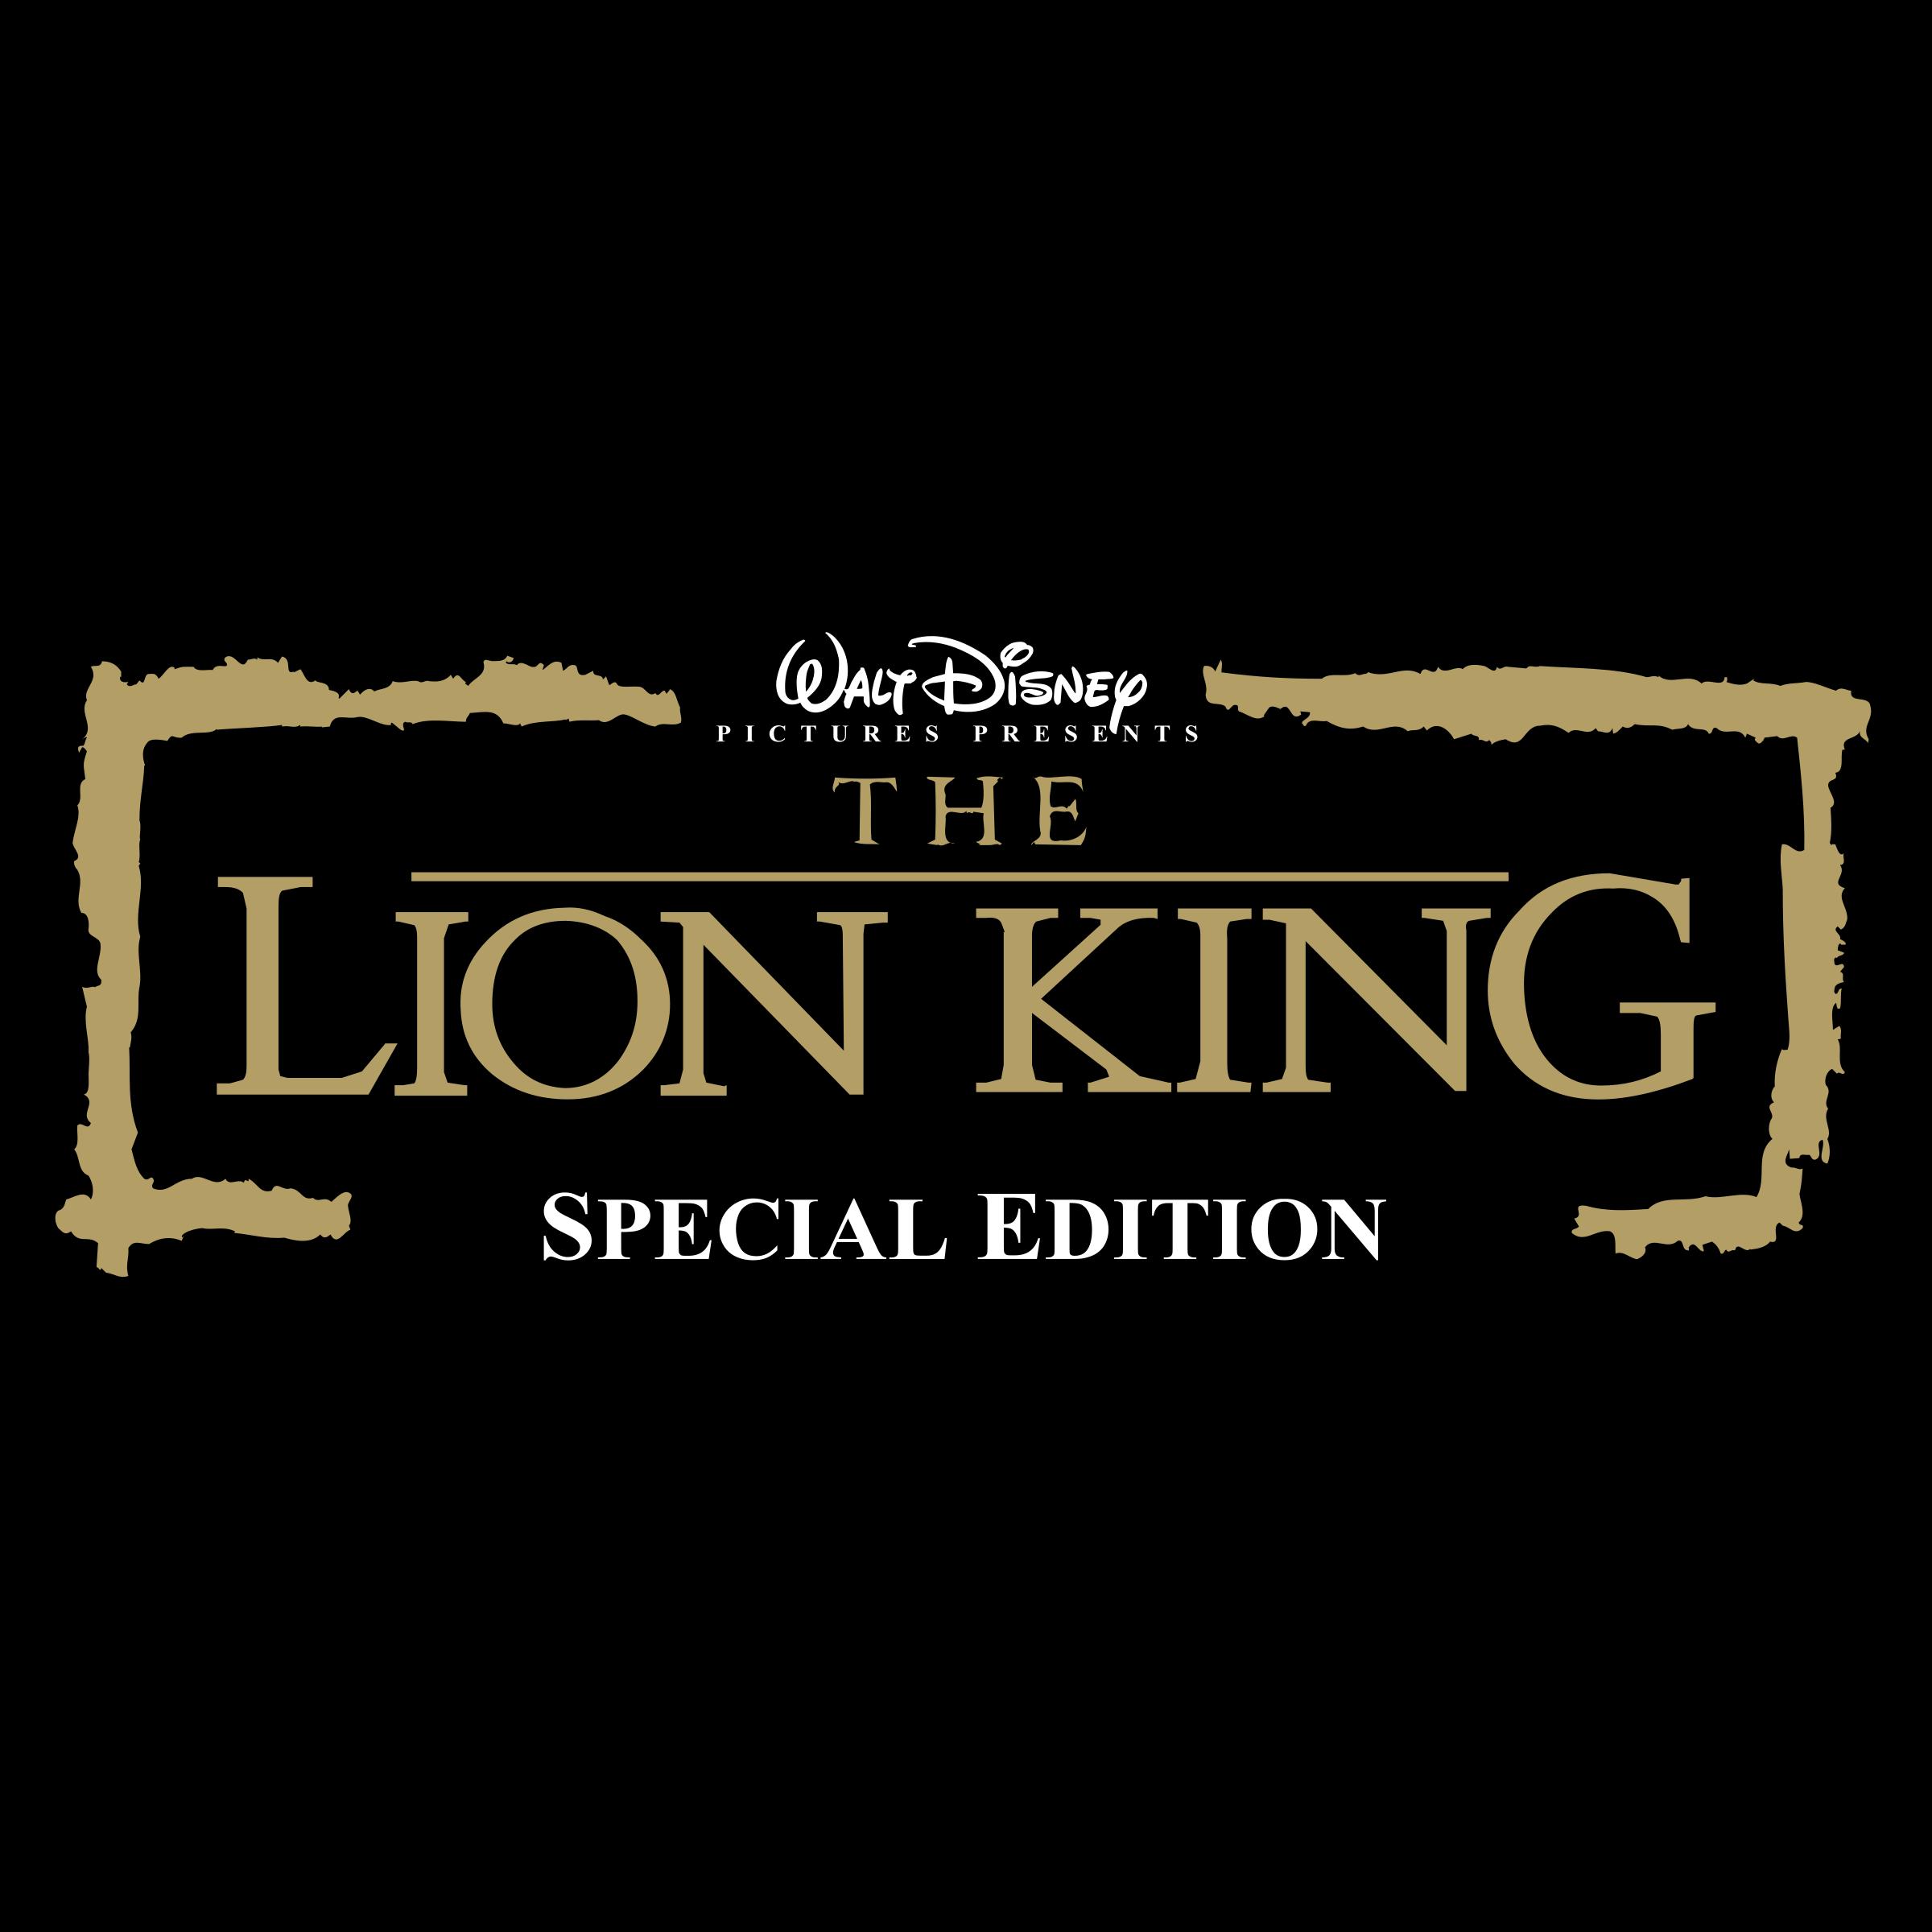 Disney The Lion King Logo Logodix